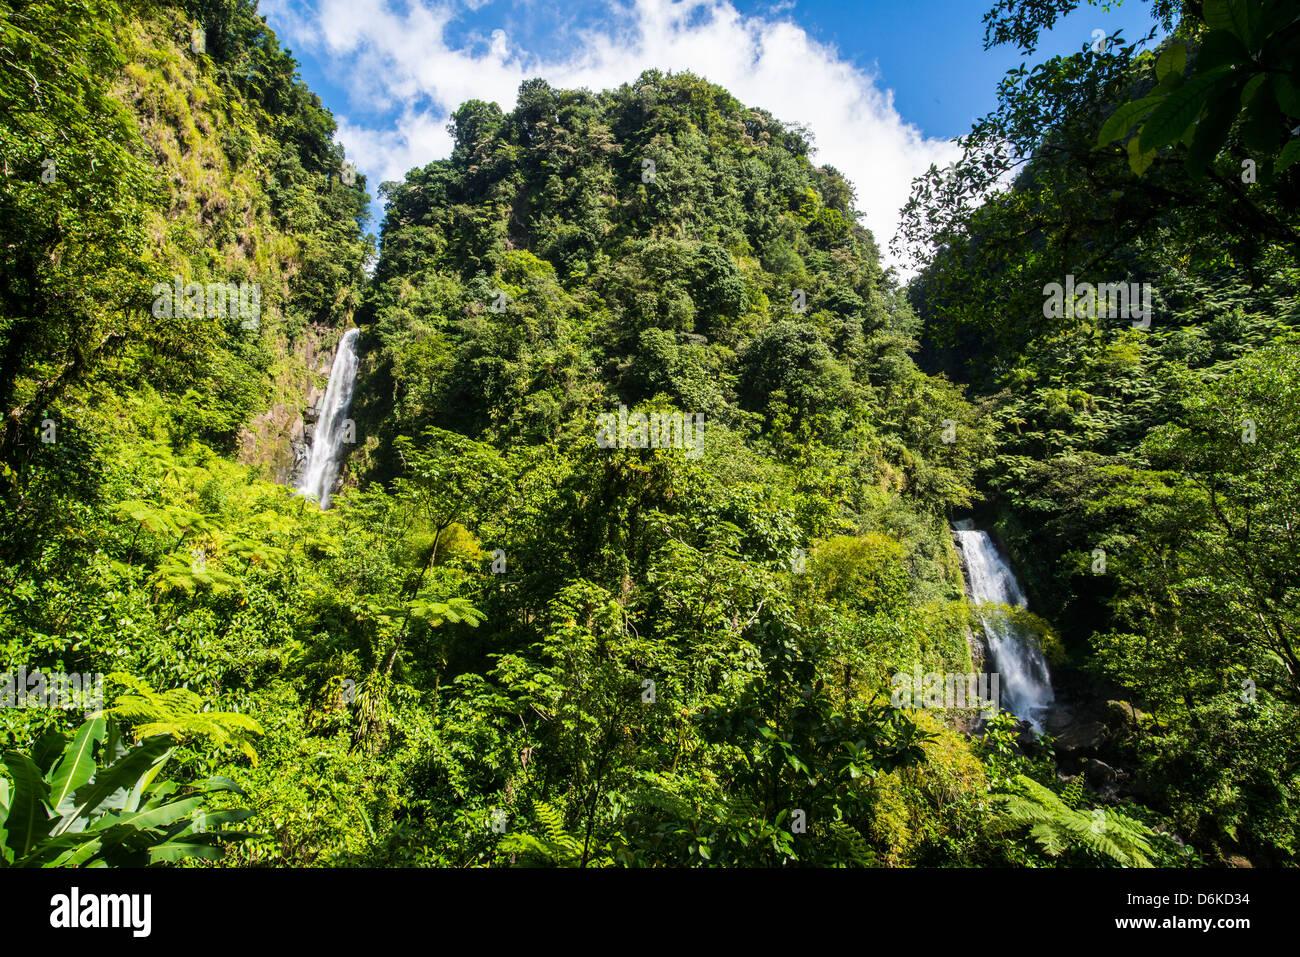 Trafalgar Wasserfälle, Morne Trois Pitons National Park, UNESCO World Heritage Site, Dominica, Karibik, Karibik, Stockbild